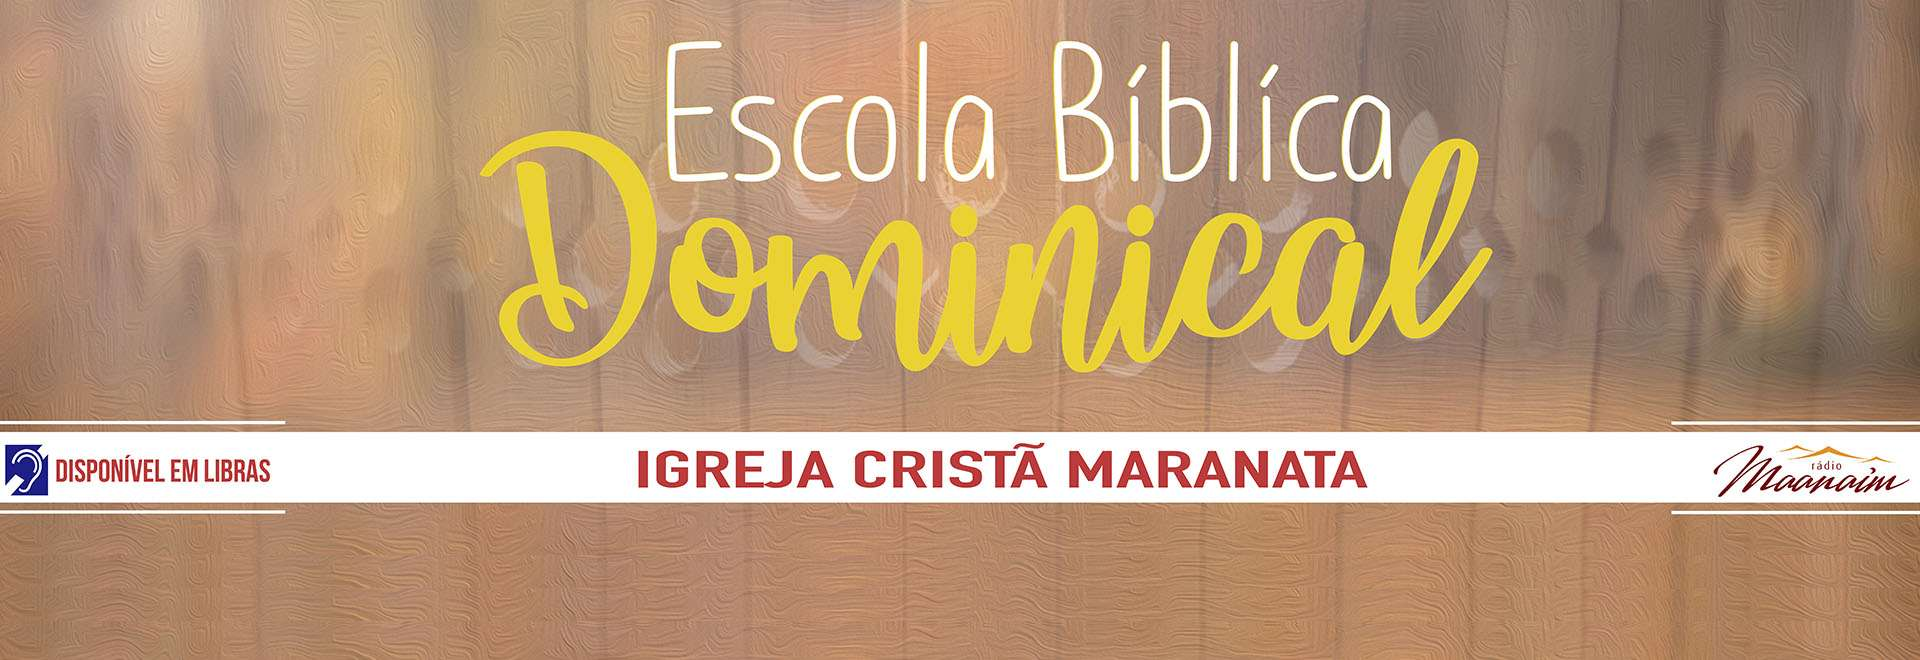 Participações da EBD da Igreja Cristã Maranata - 25/04/2021